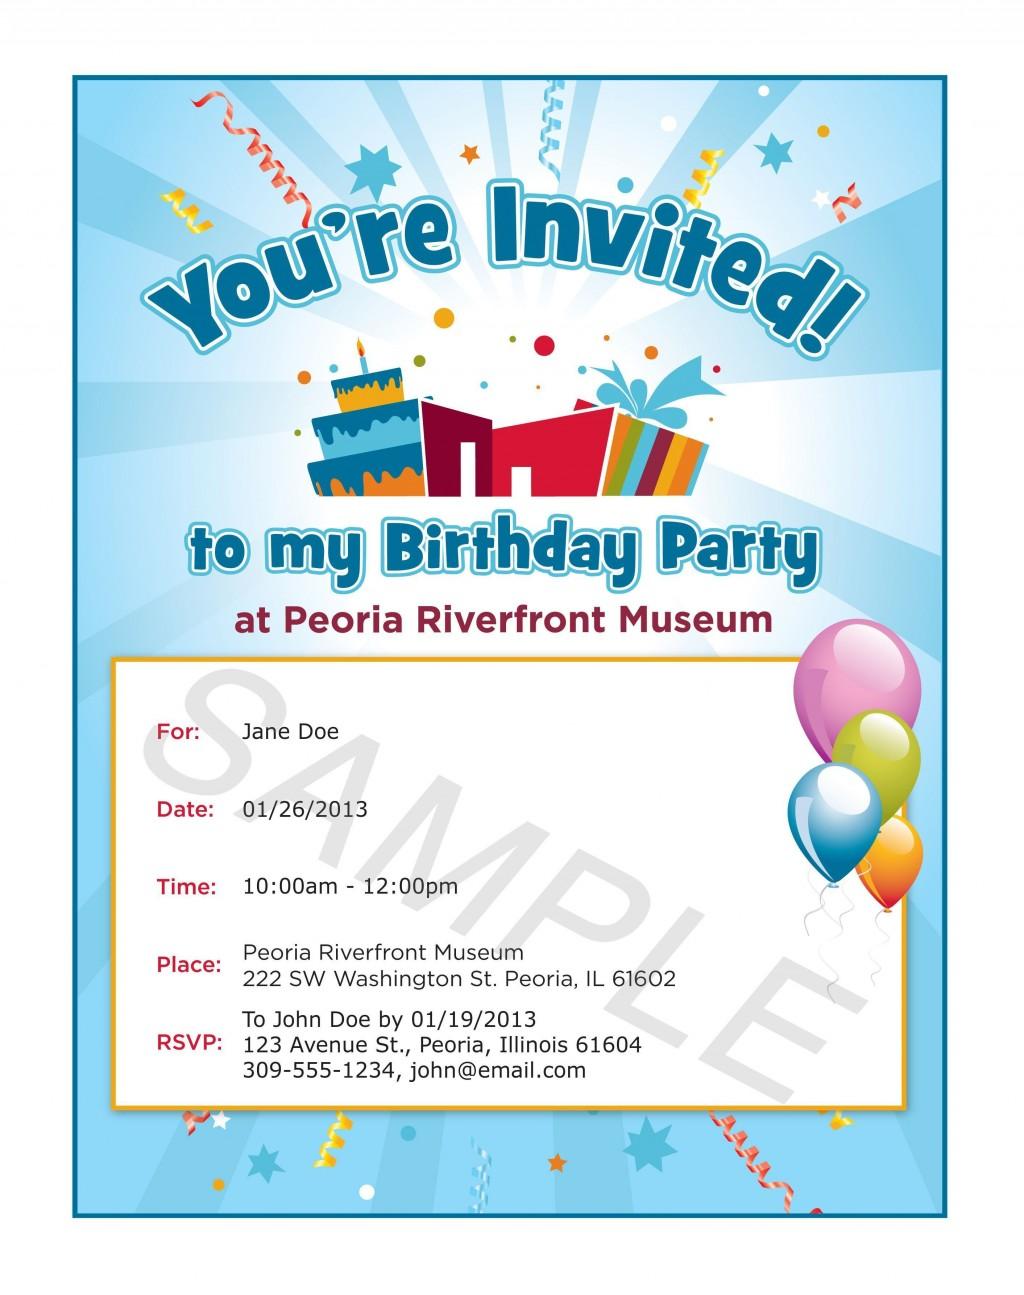 002 Fascinating Birthday Party Invitation Template Word Idea  40th Wording Sample Unicorn FreeLarge